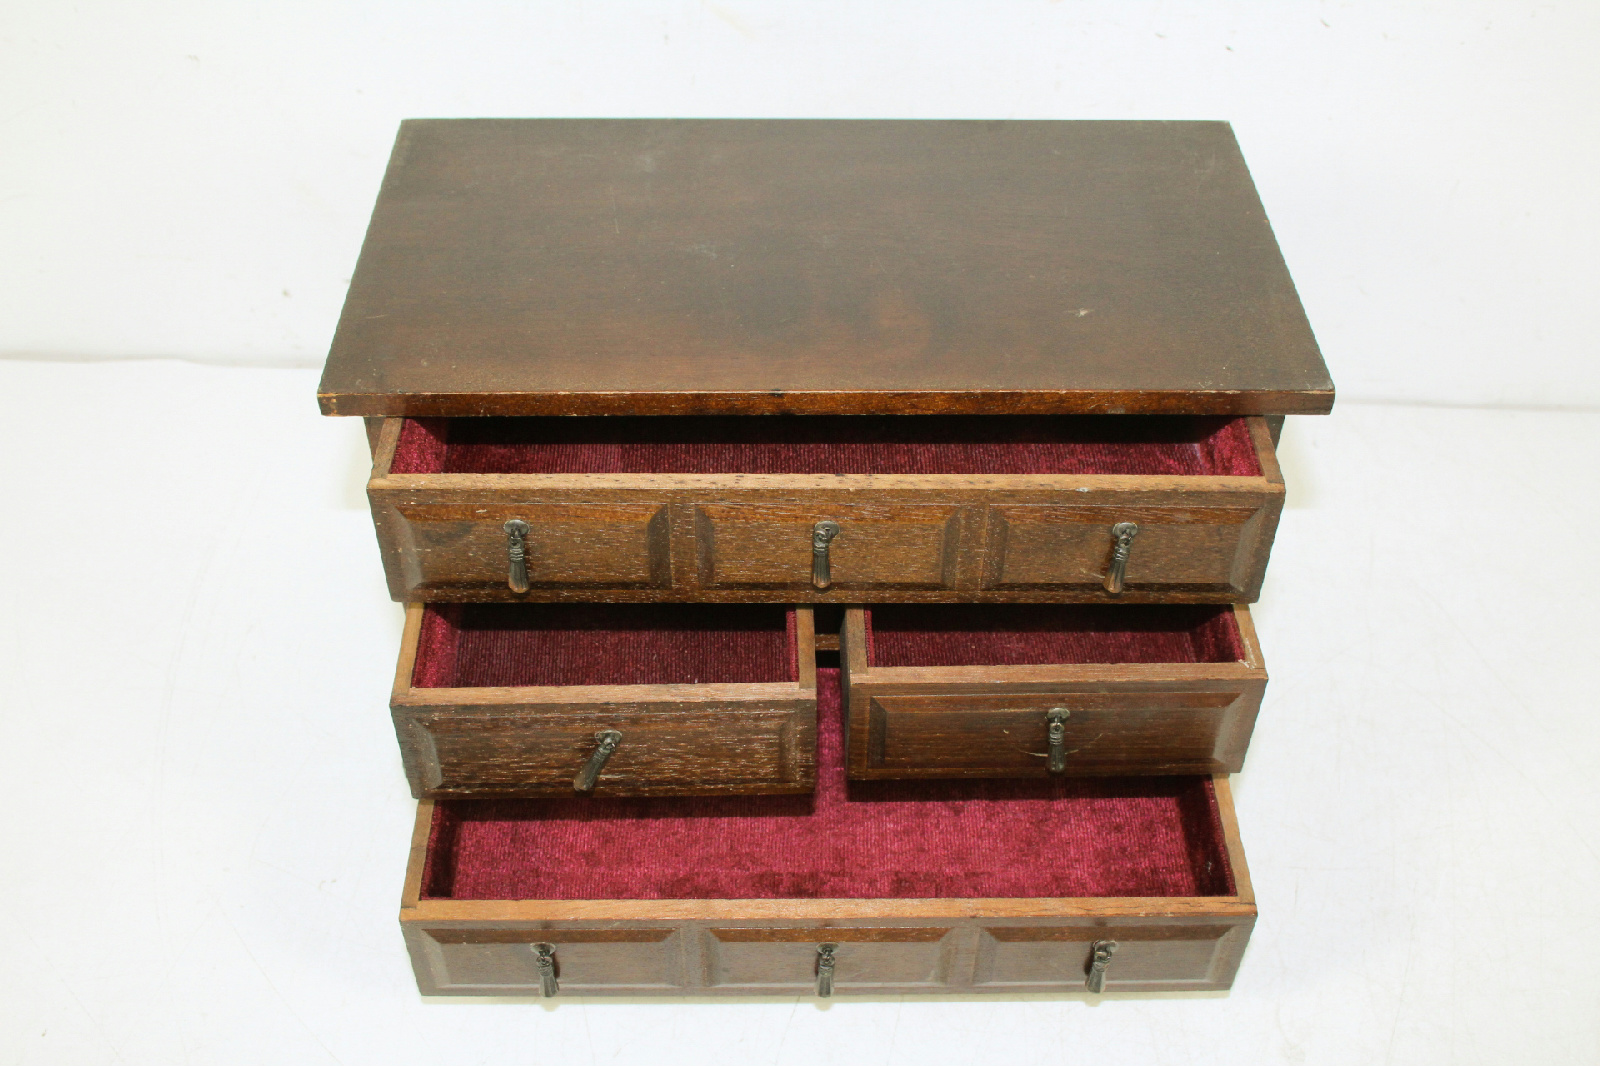 Vintage wood wooden jewelry trinket organizer storage box